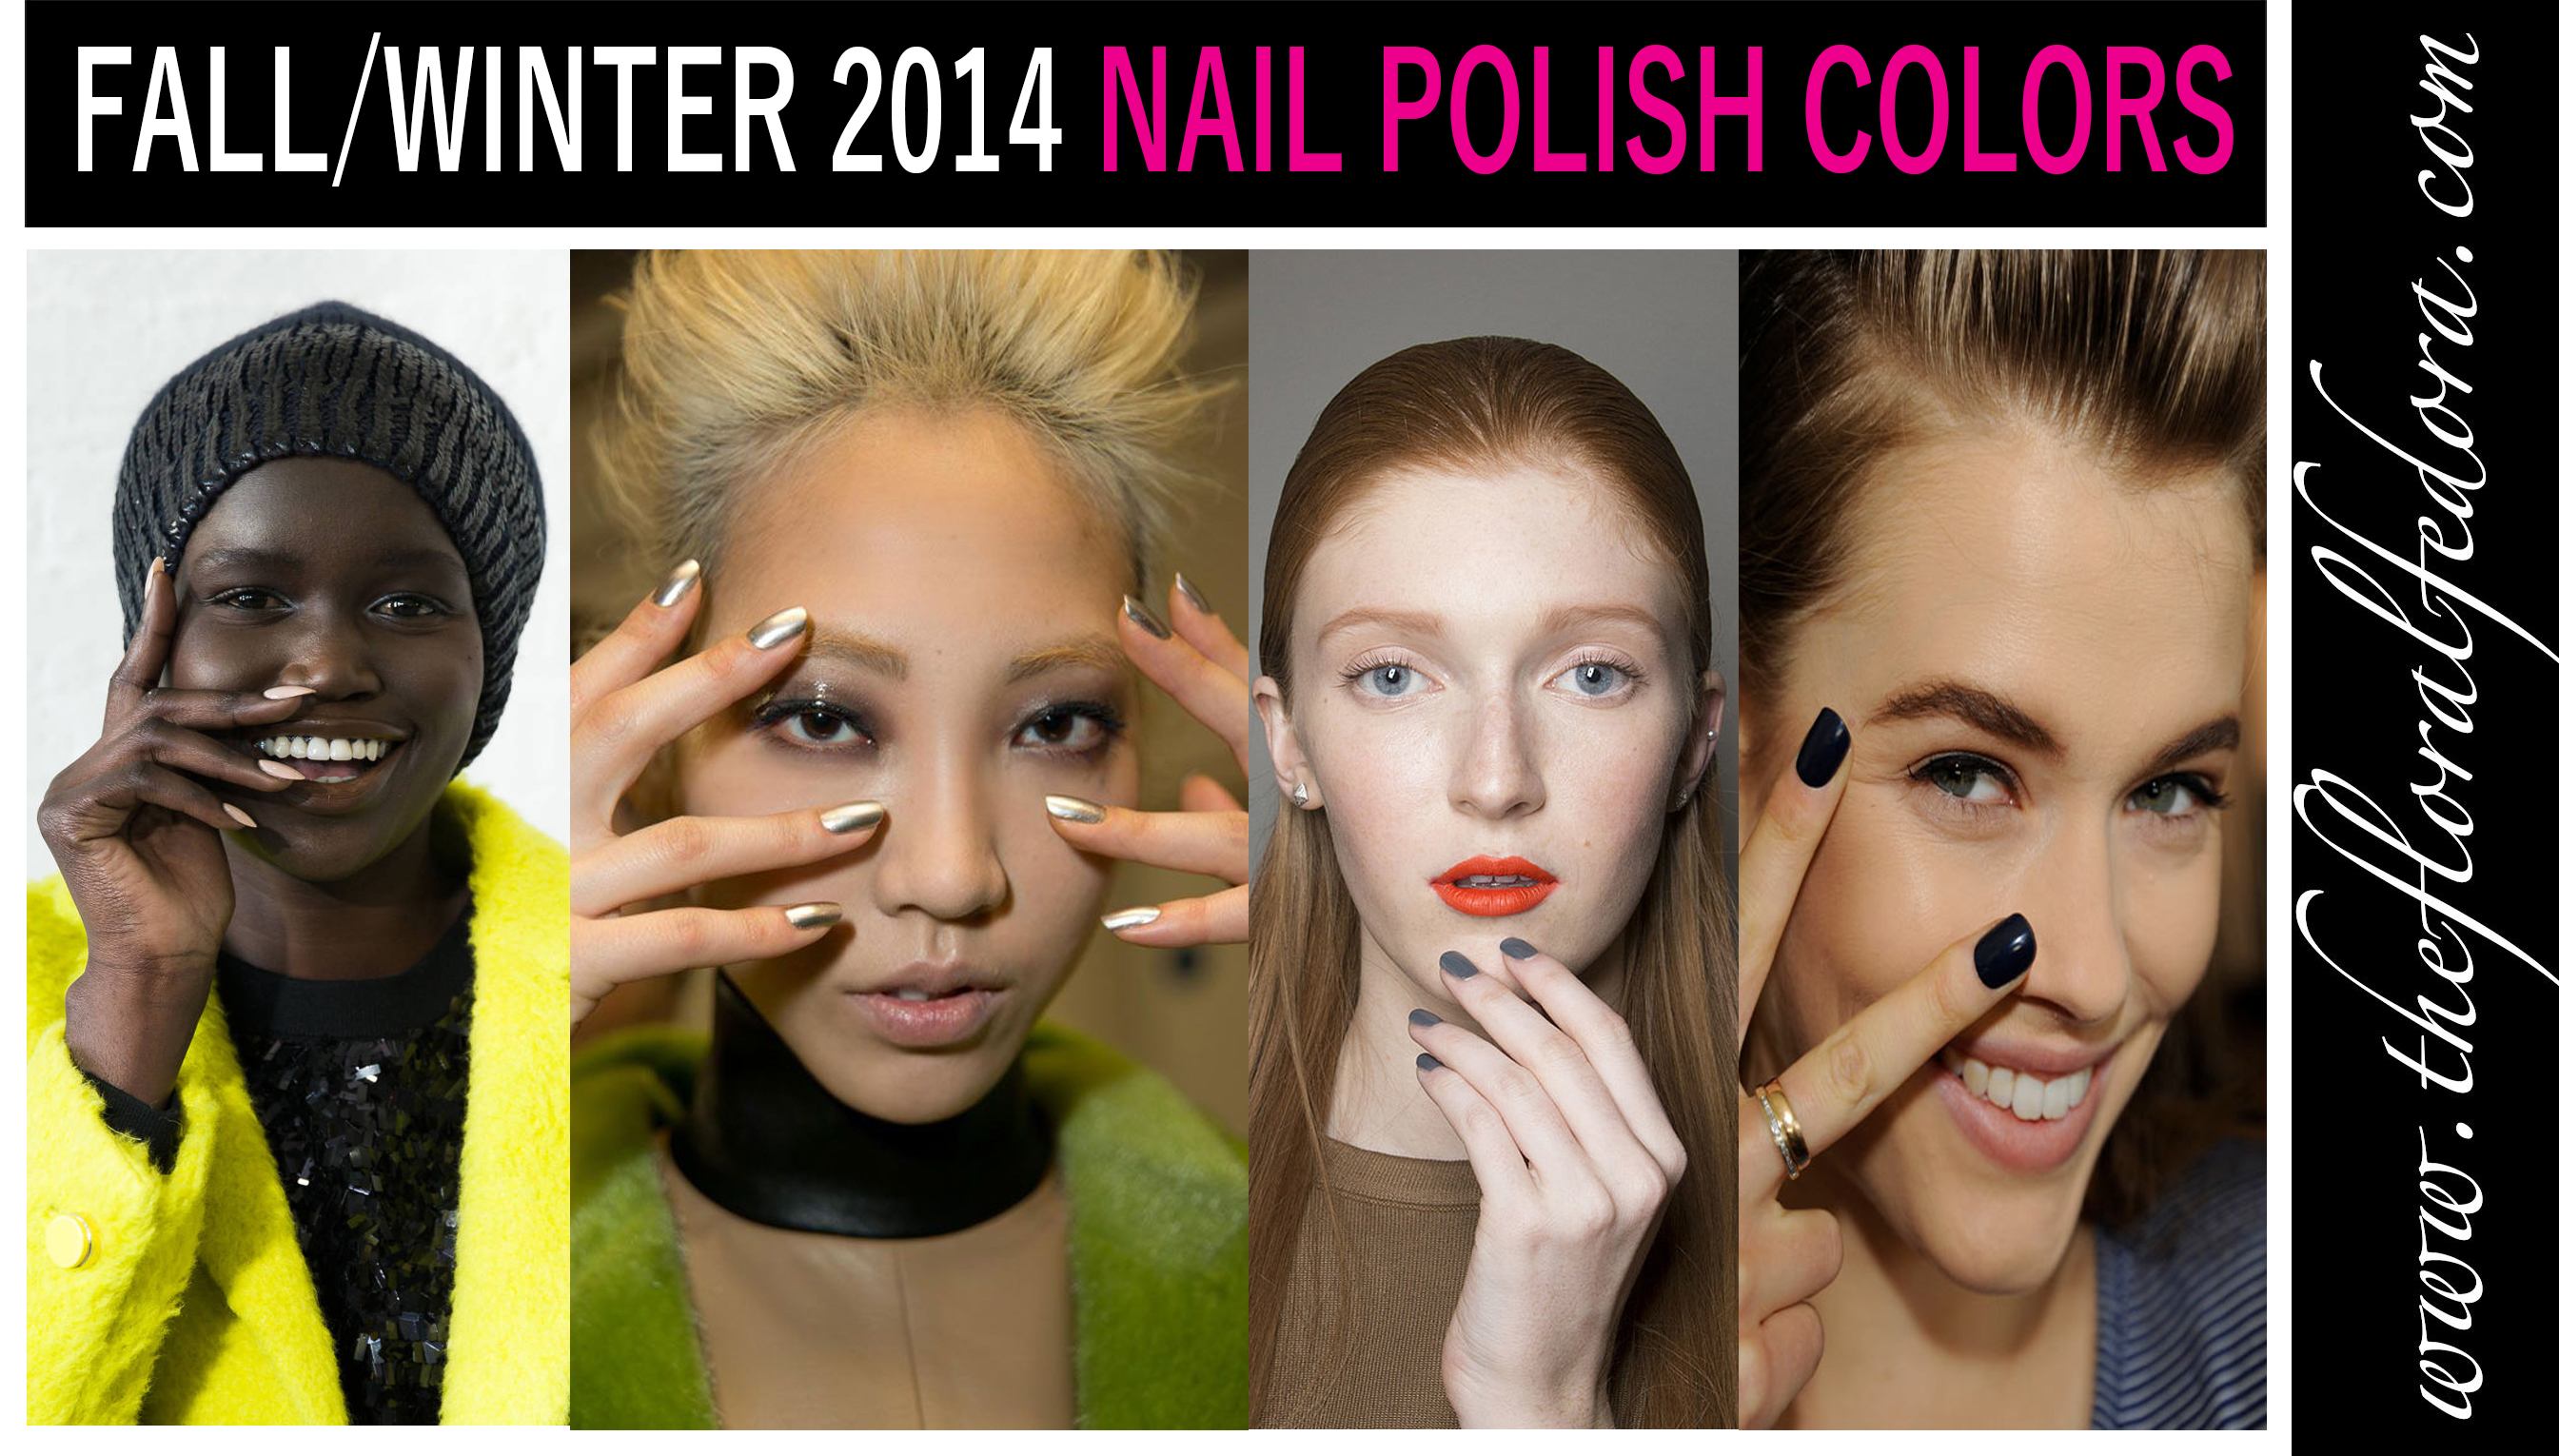 Fallwinter 2014 Nail Polish Colors The Floral Fedora